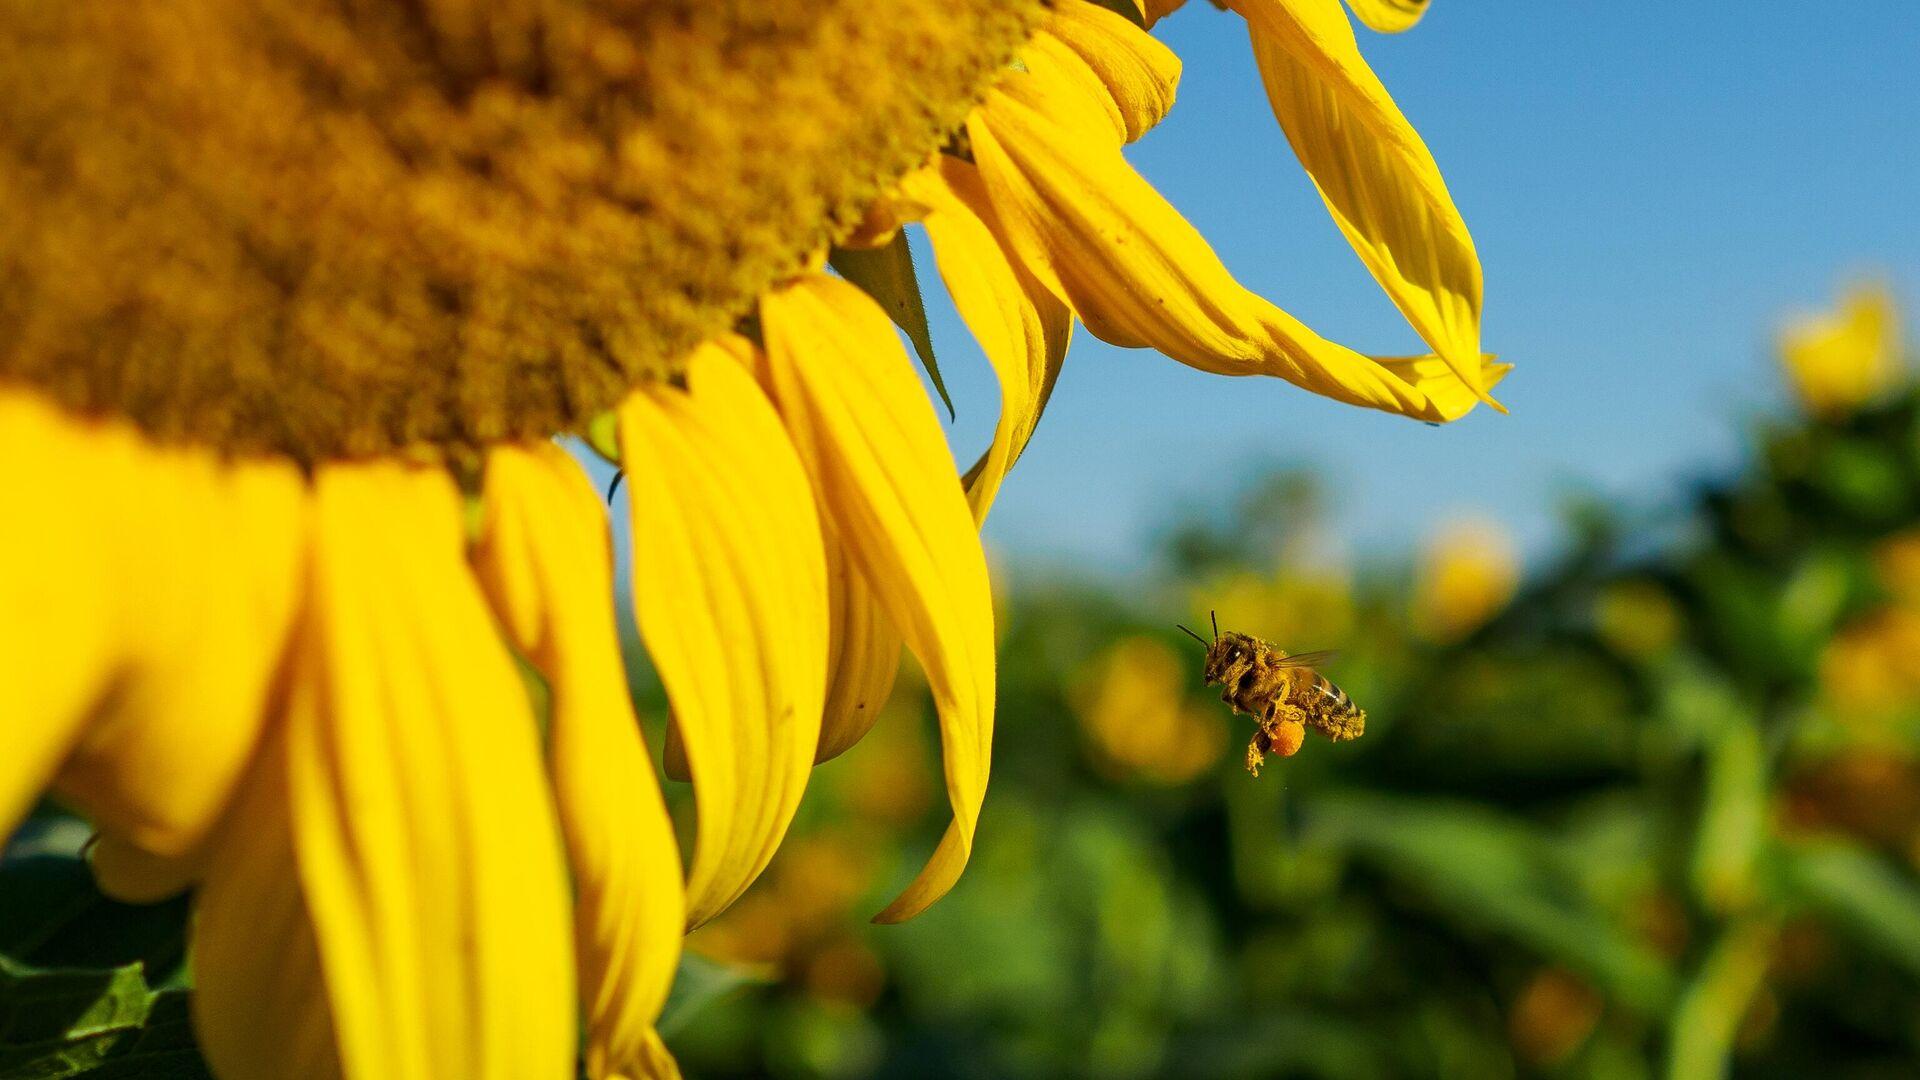 Пчела около цветка подсолнечника - РИА Новости, 1920, 20.10.2020